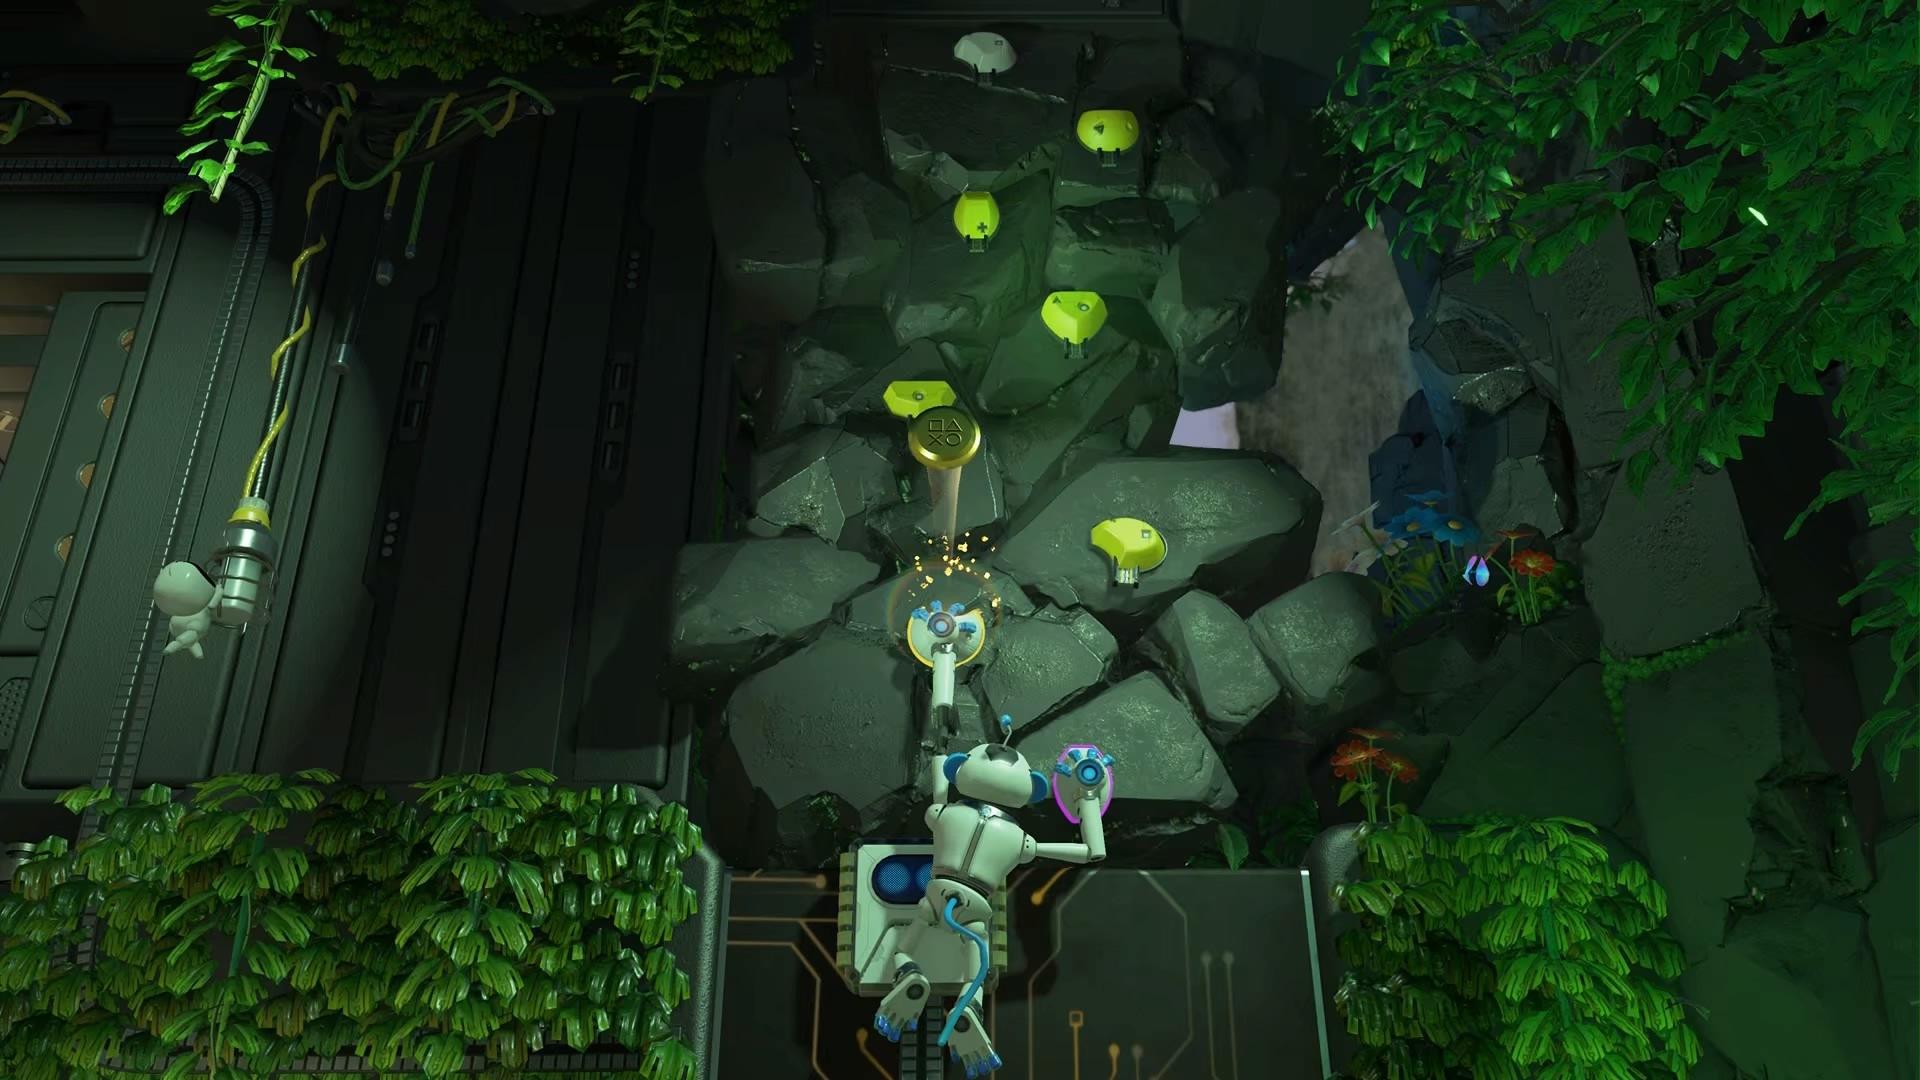 Astros Playroom® テラフロップ岩壁-1